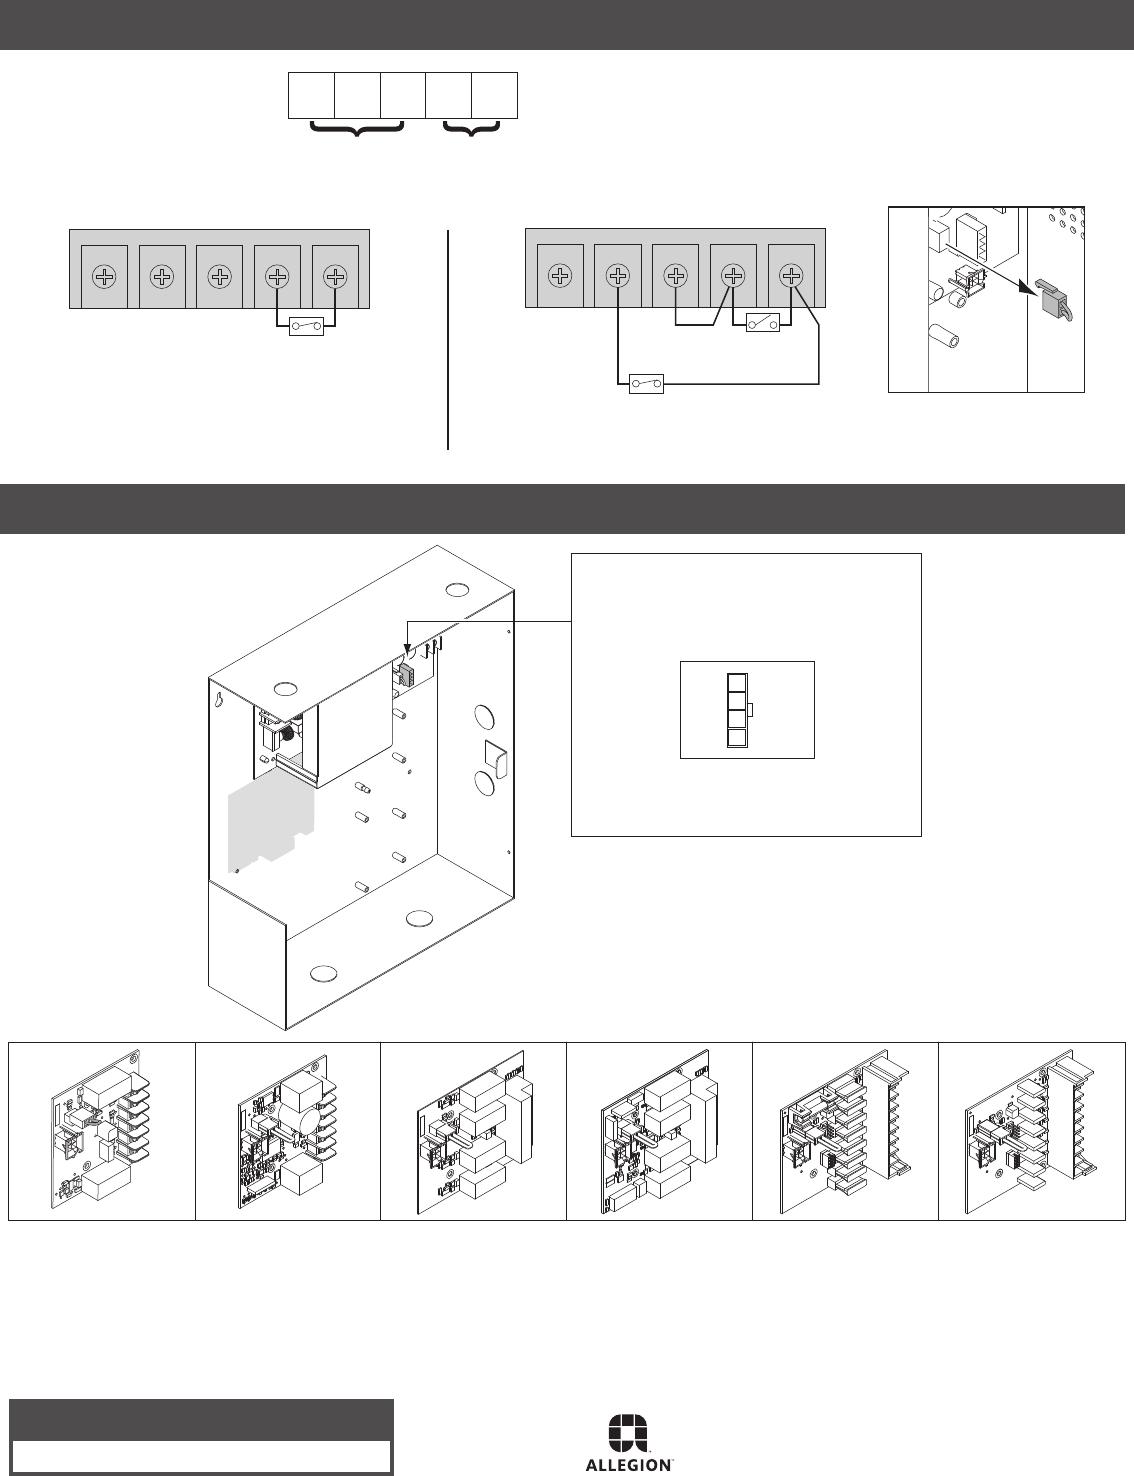 Locks PS902 Instructions 106440 | Ps902 Power Supply Wiring Diagram |  | UserManual.wiki